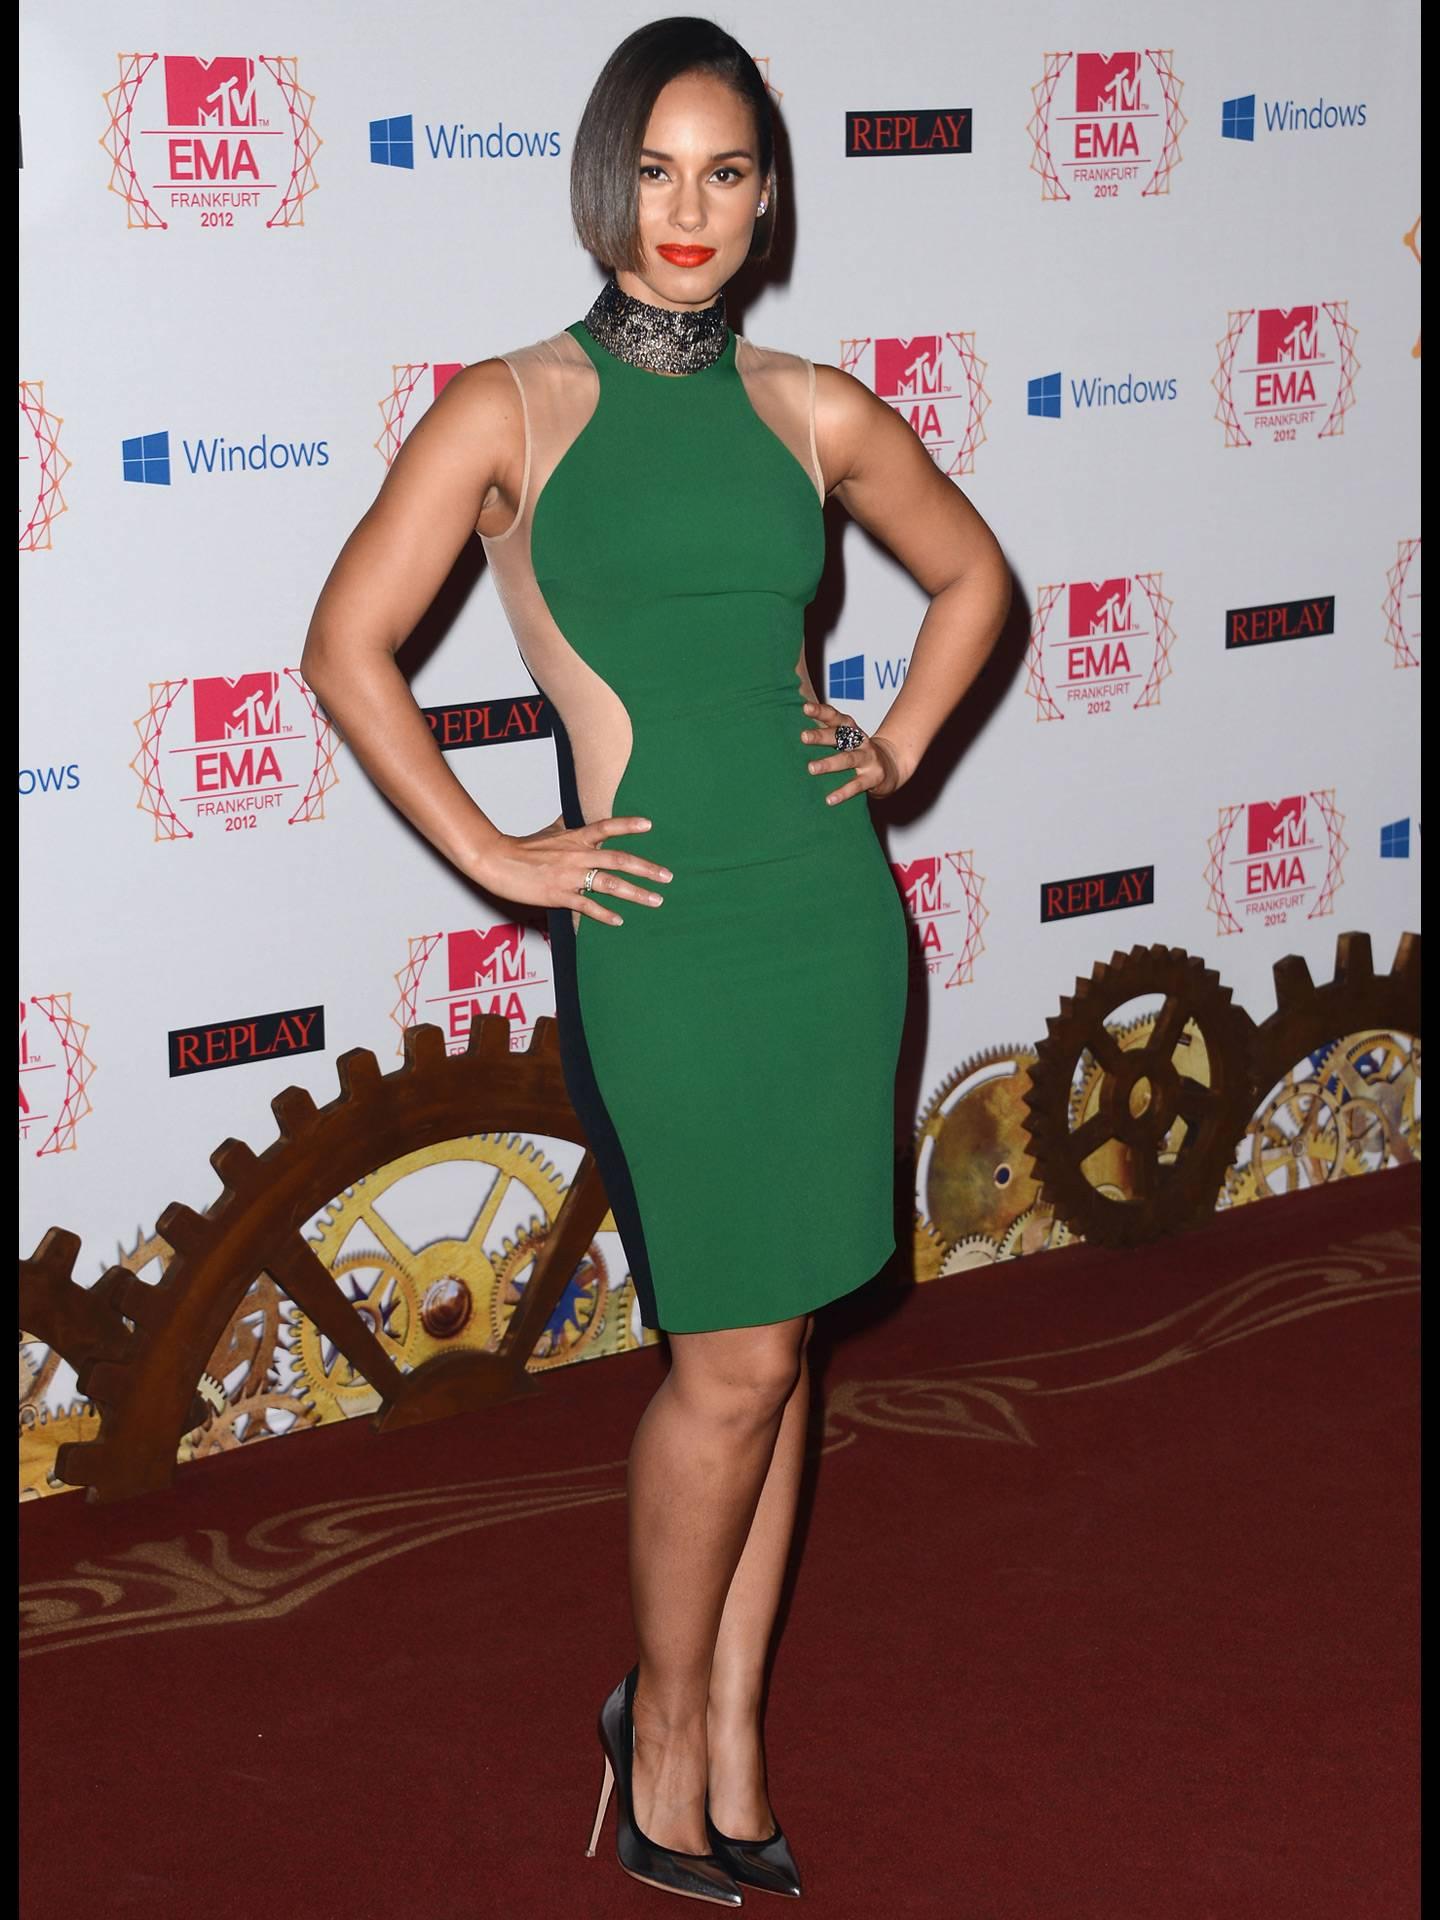 mgid:file:gsp:scenic:/international/mtvla.com/Alicia-Keys_Getty-Images-For-MTV_156031595.jpg